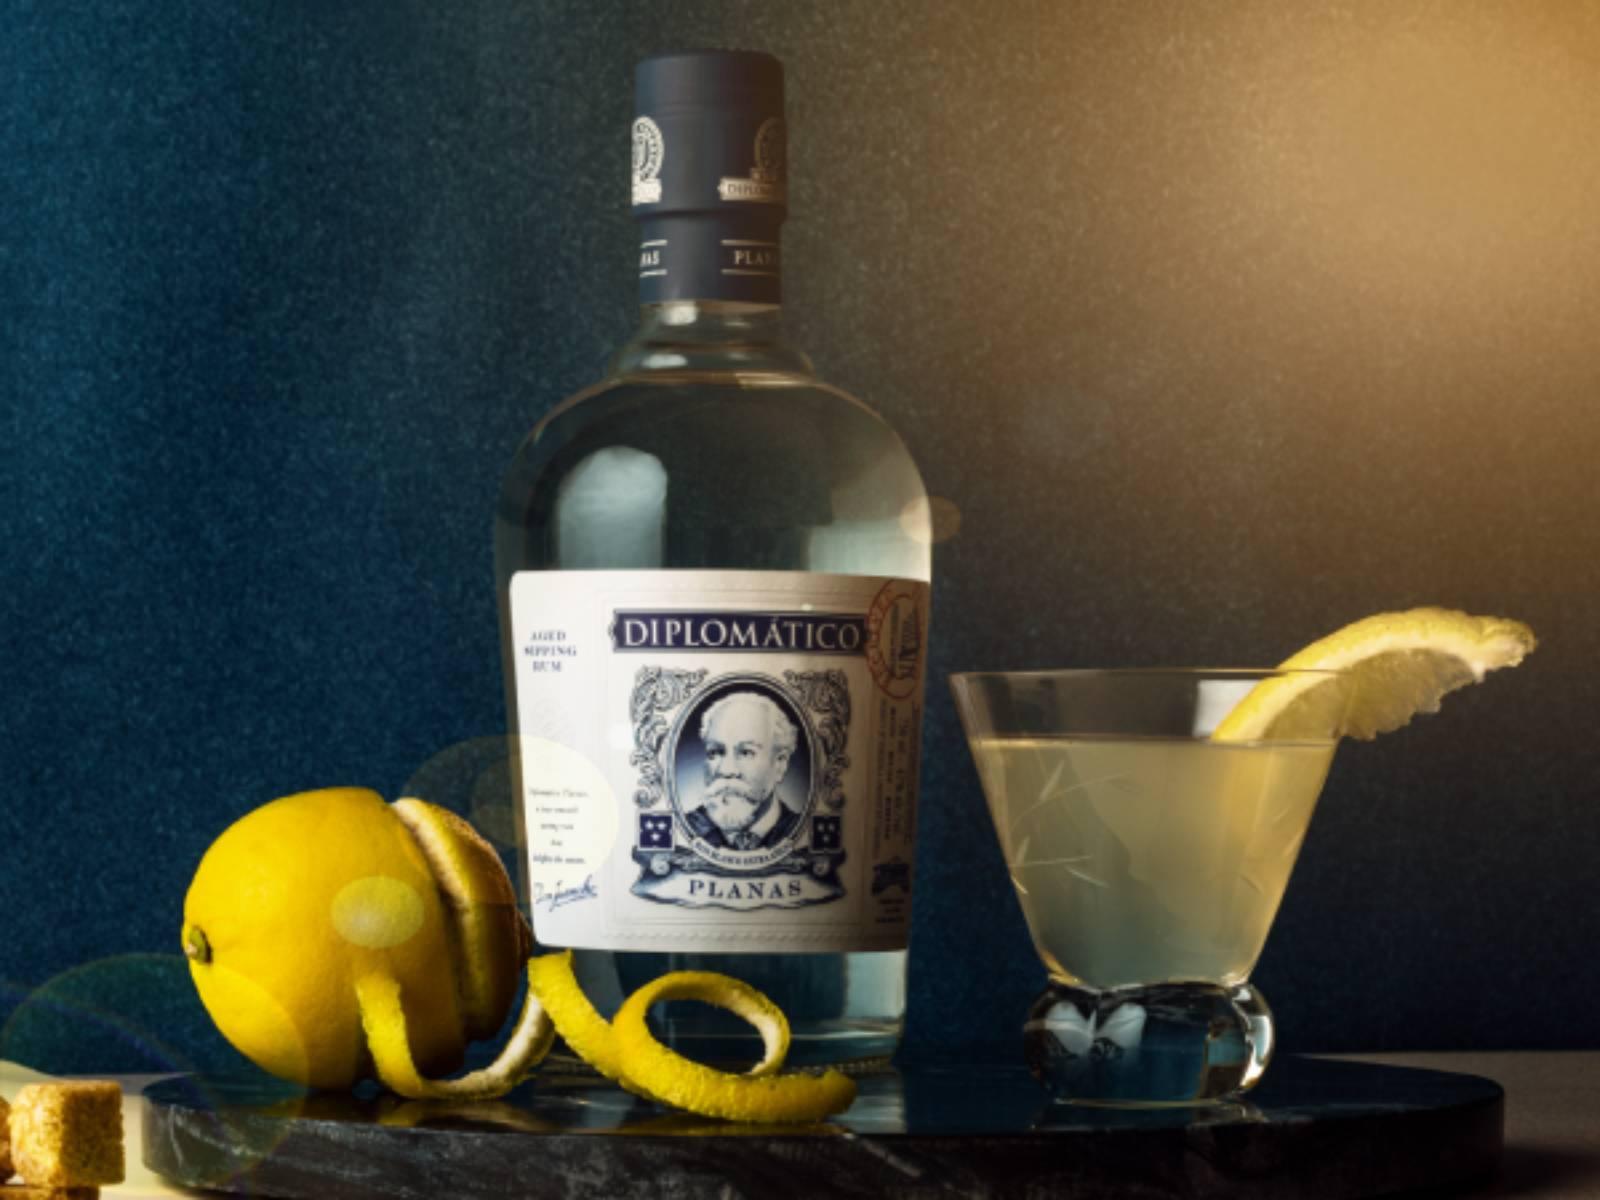 Planas Daiquiri cocktail